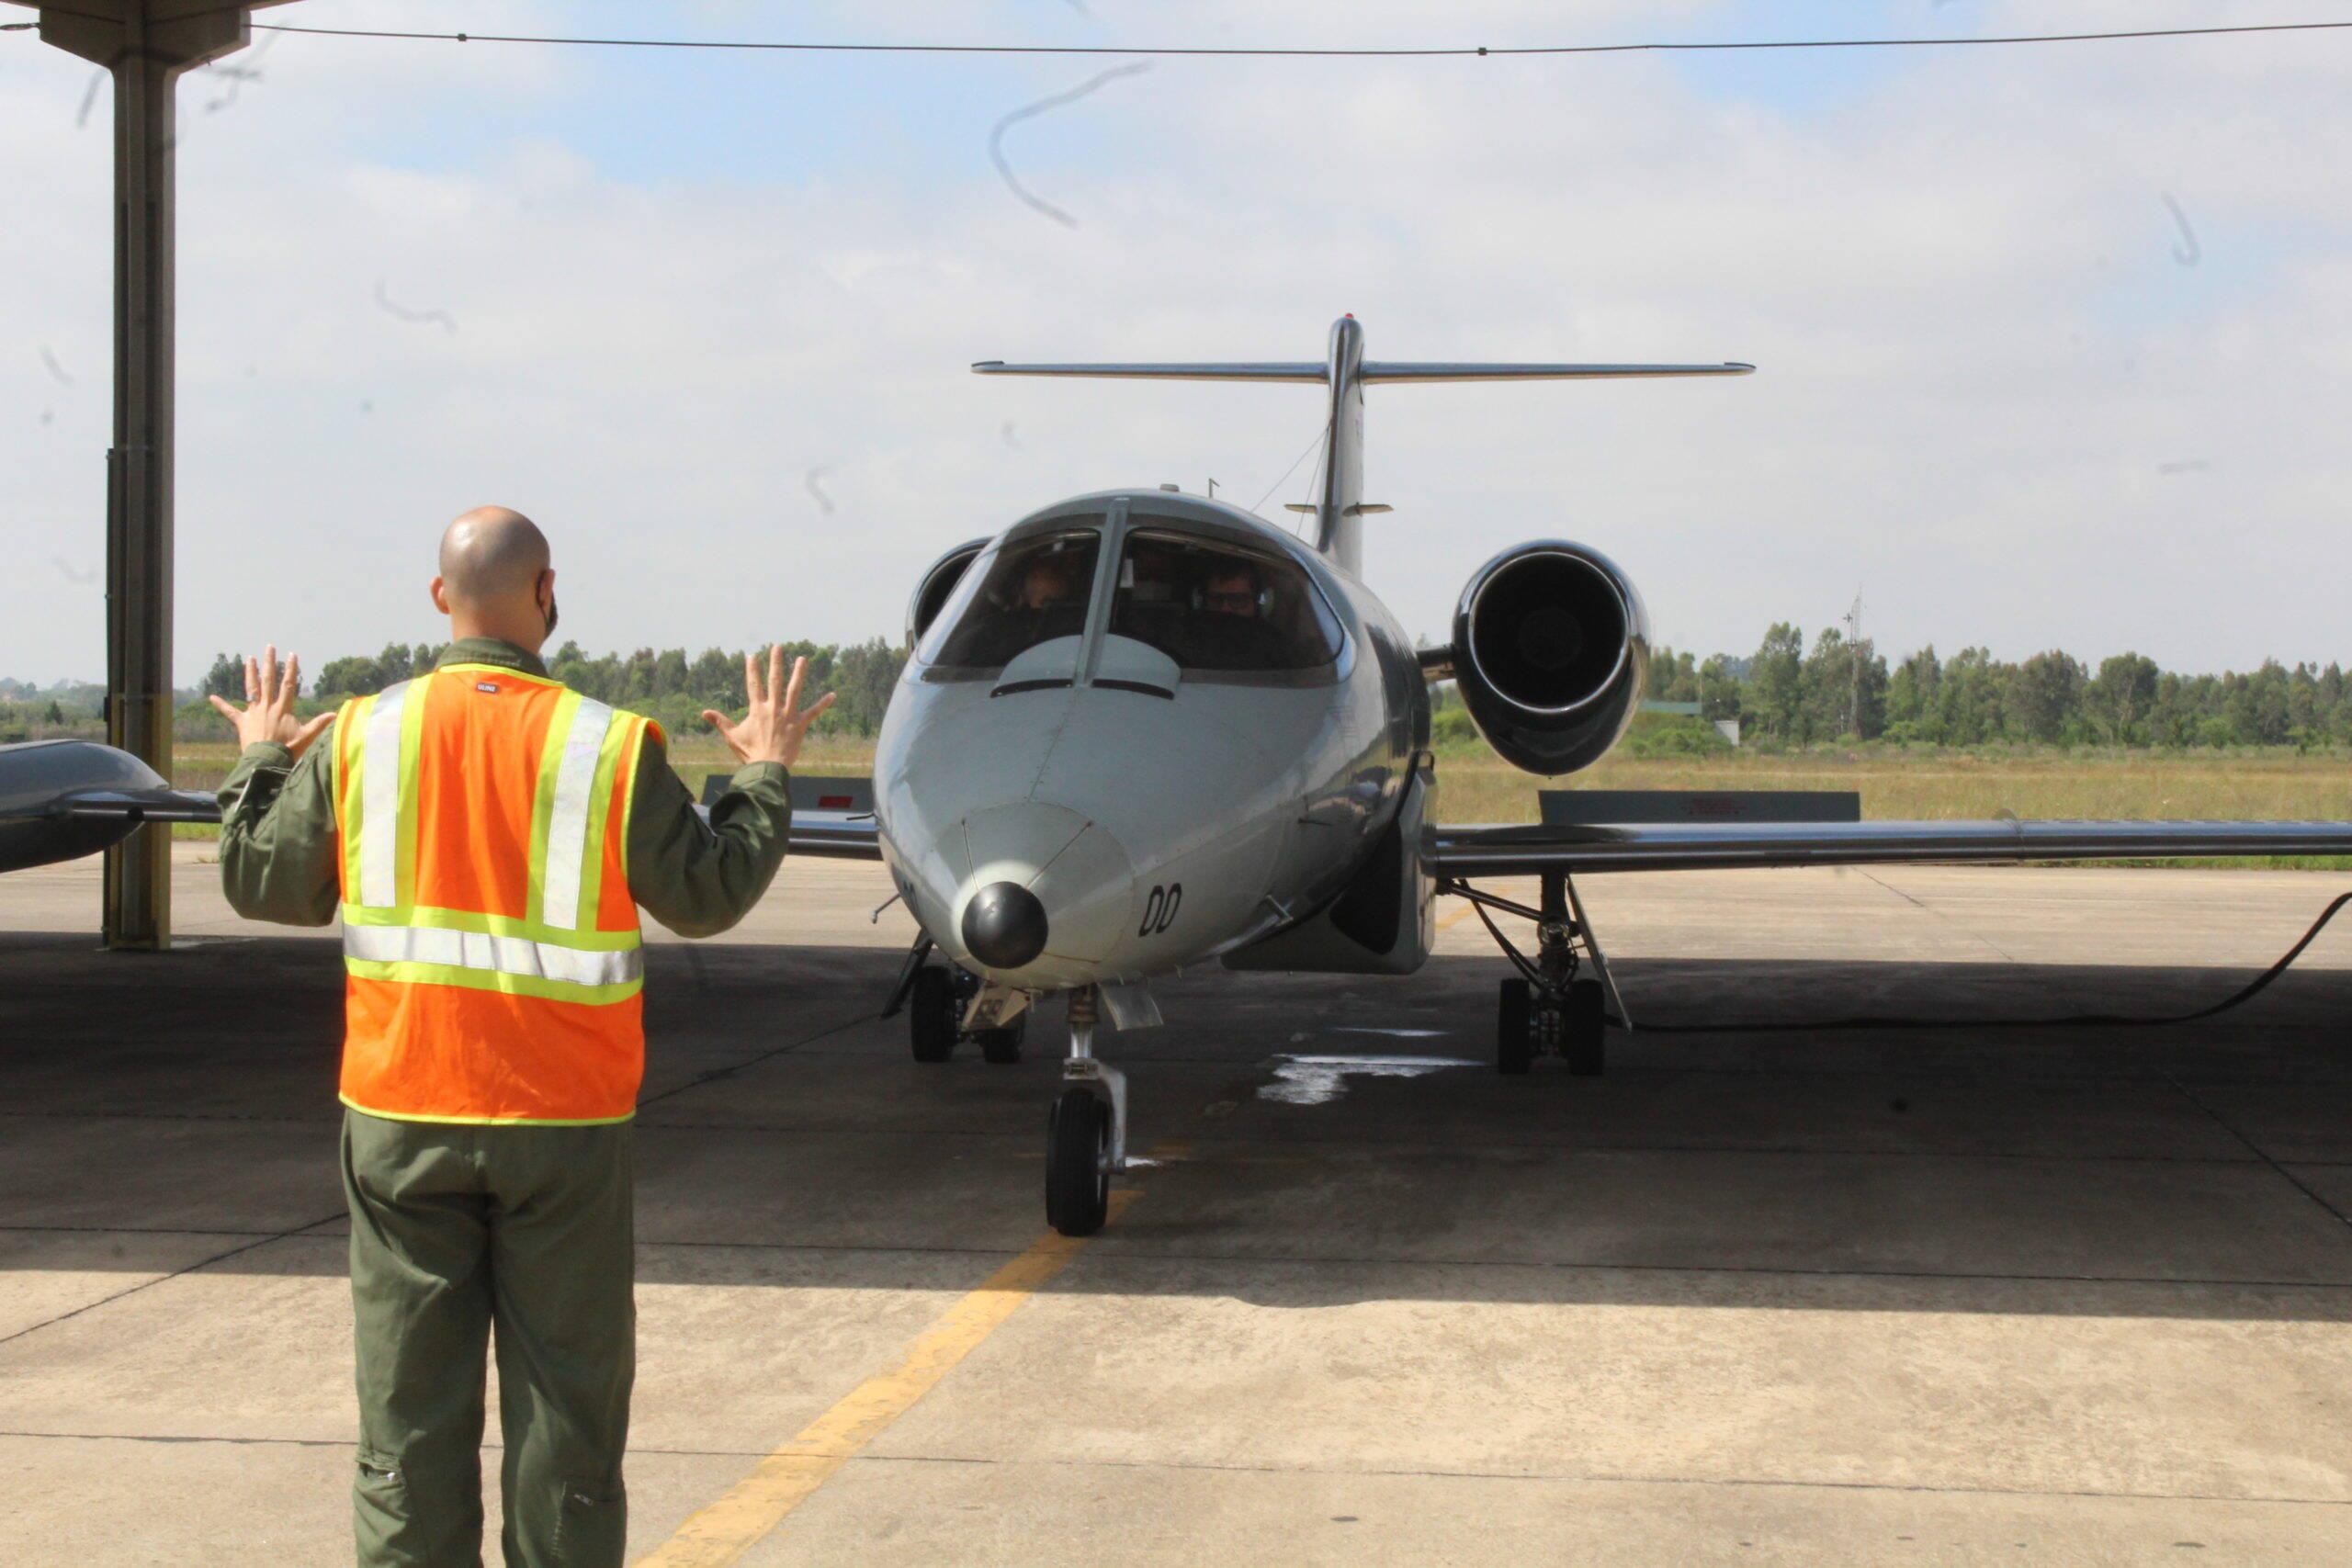 Learjet R-35A da FAB realiza sua última missão operacional